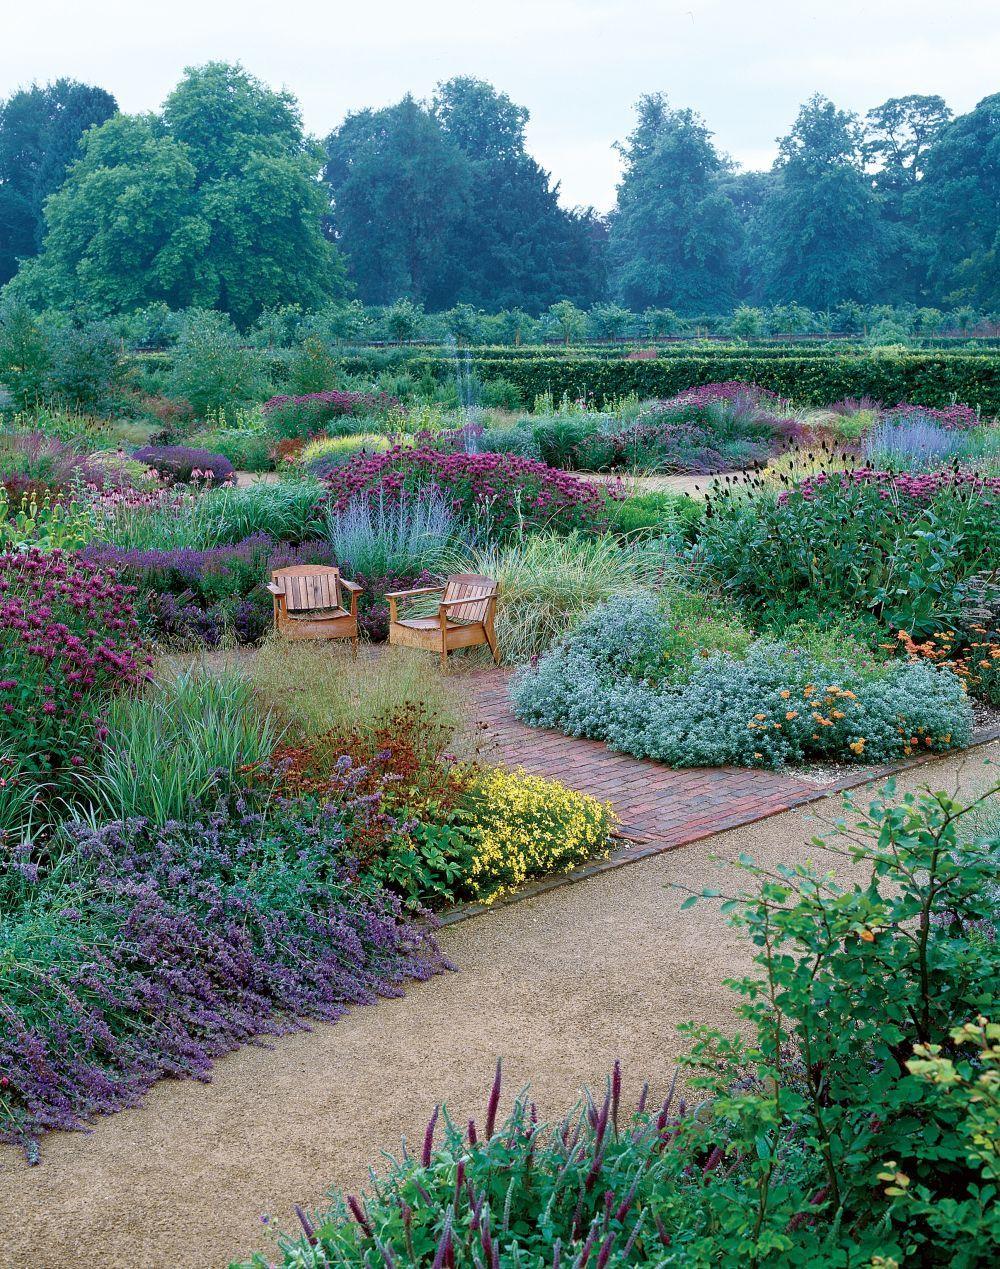 Contemporary Garden by Piet Oudolf in Yorkshire, England ...